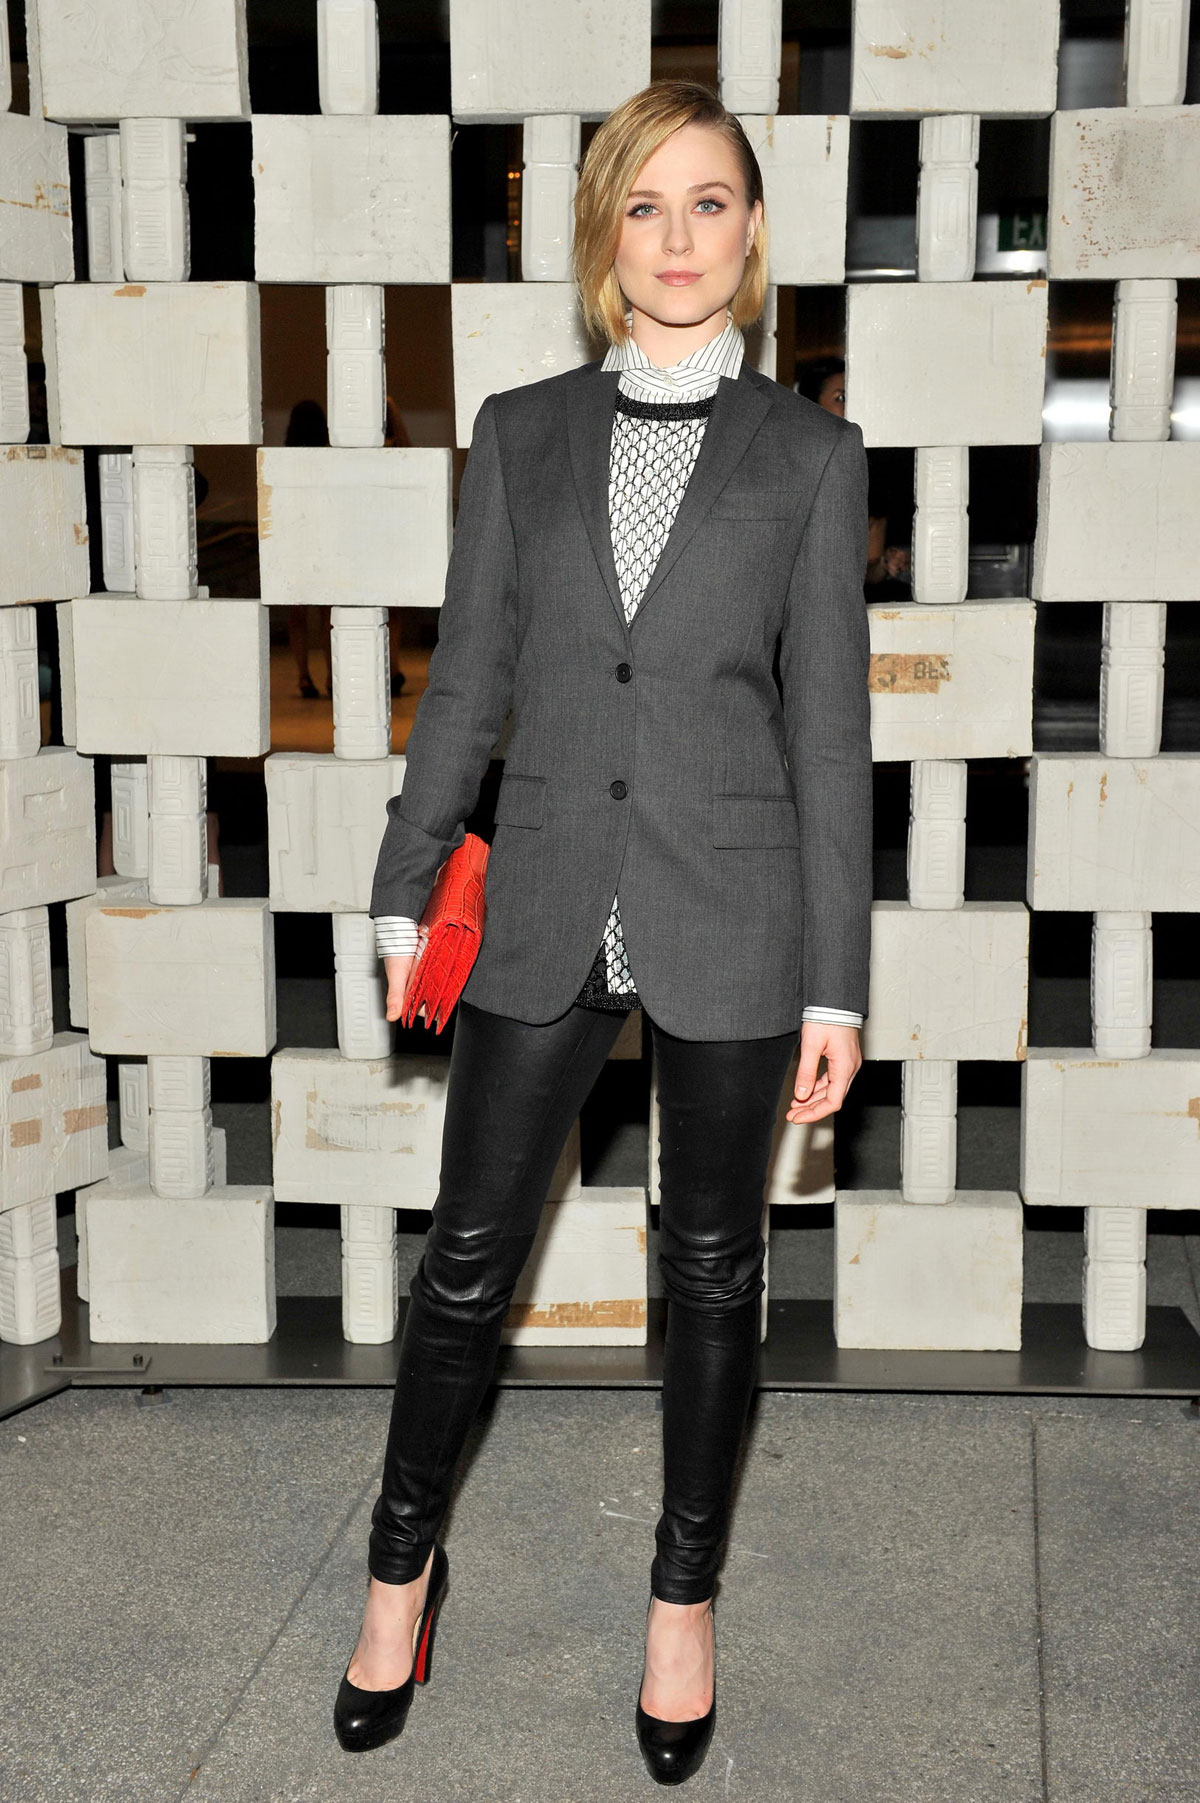 Evan Rachel Wood attends Hammer Museum's 12th annual Gala